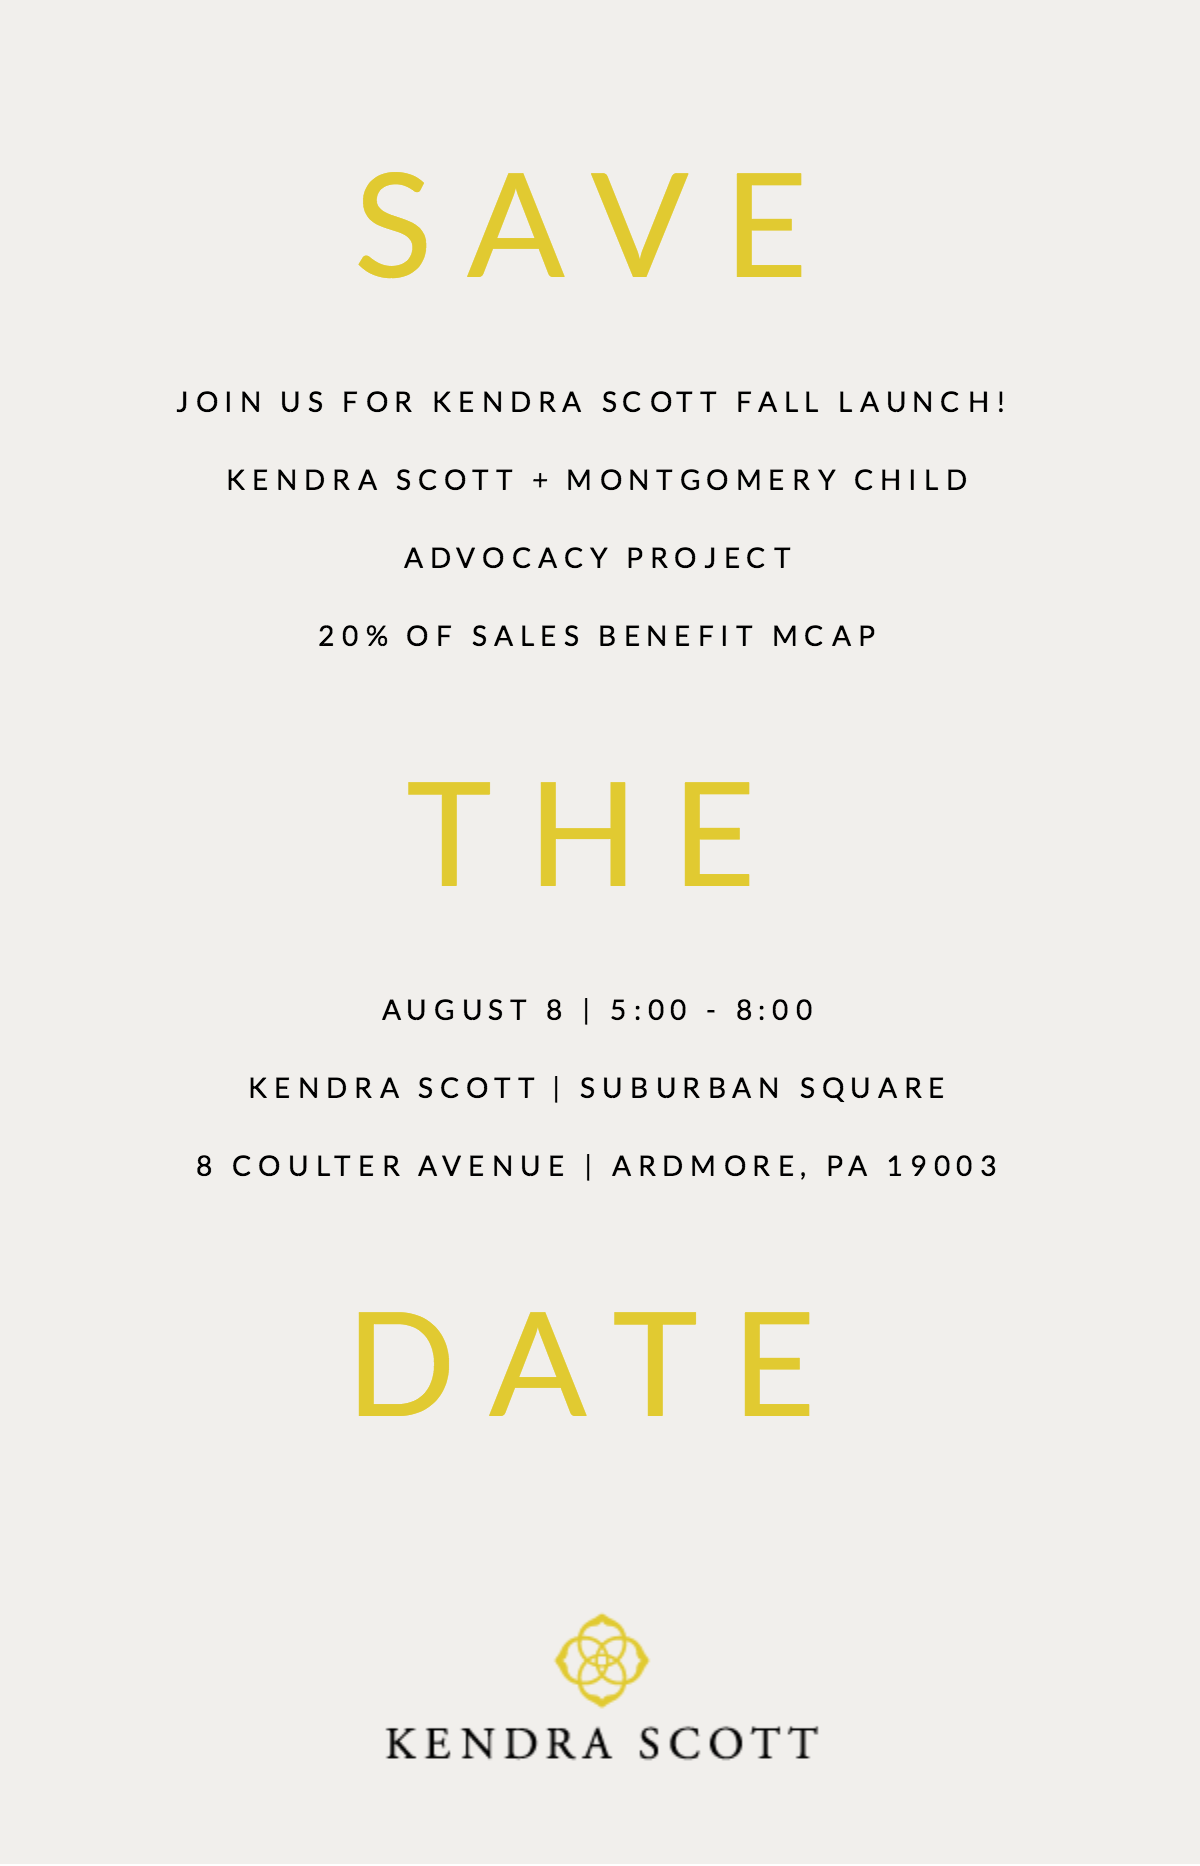 Kendra Scott Fall Launch